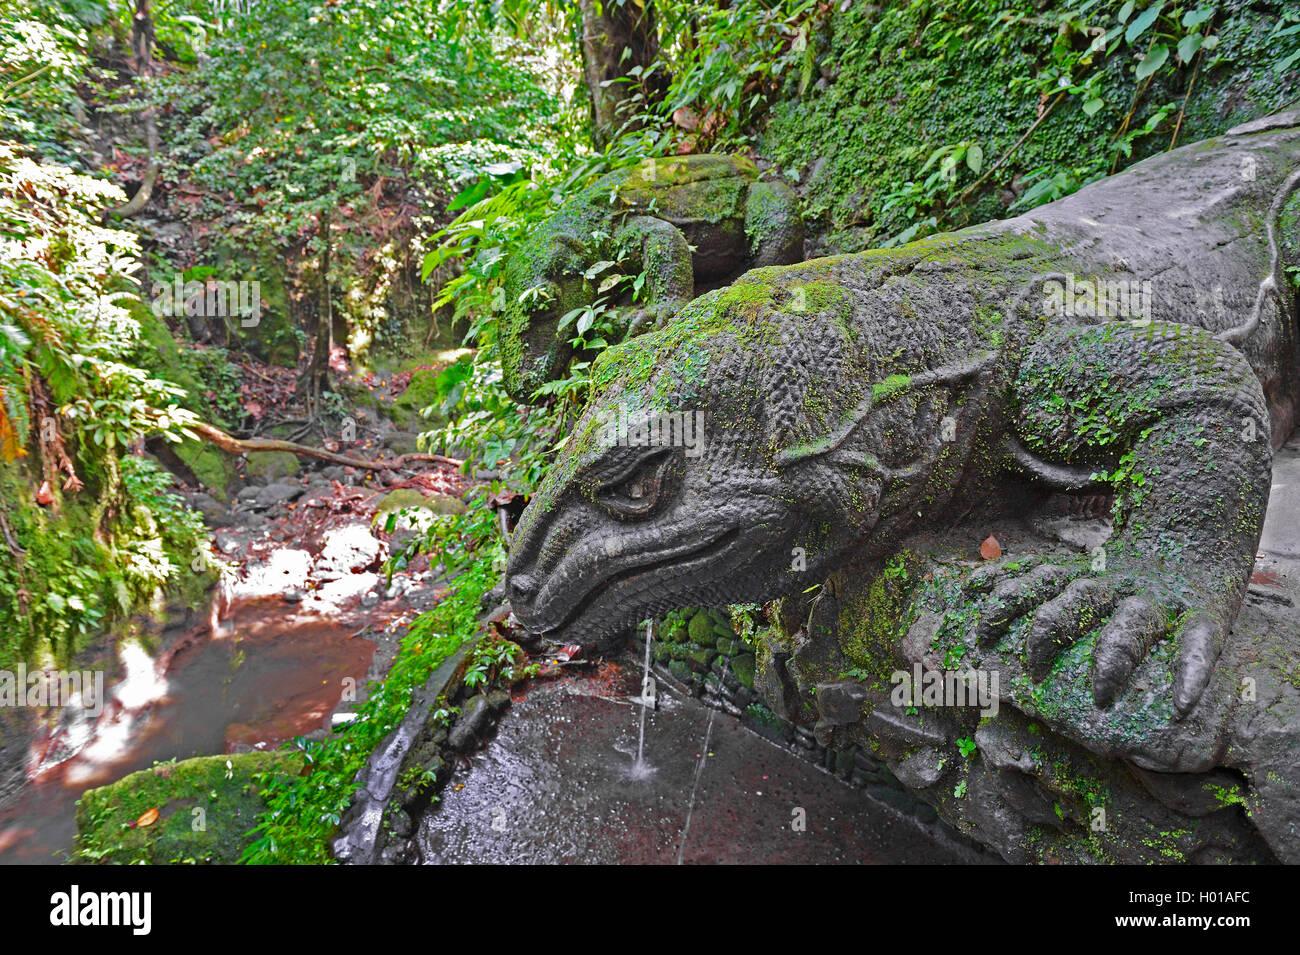 Komodo-Waran, Komodo Waran, Komodowaran (Varanus komodoensis), steinerne Komodowarane im Holy Spring Temple, Affenwald, Stock Photo